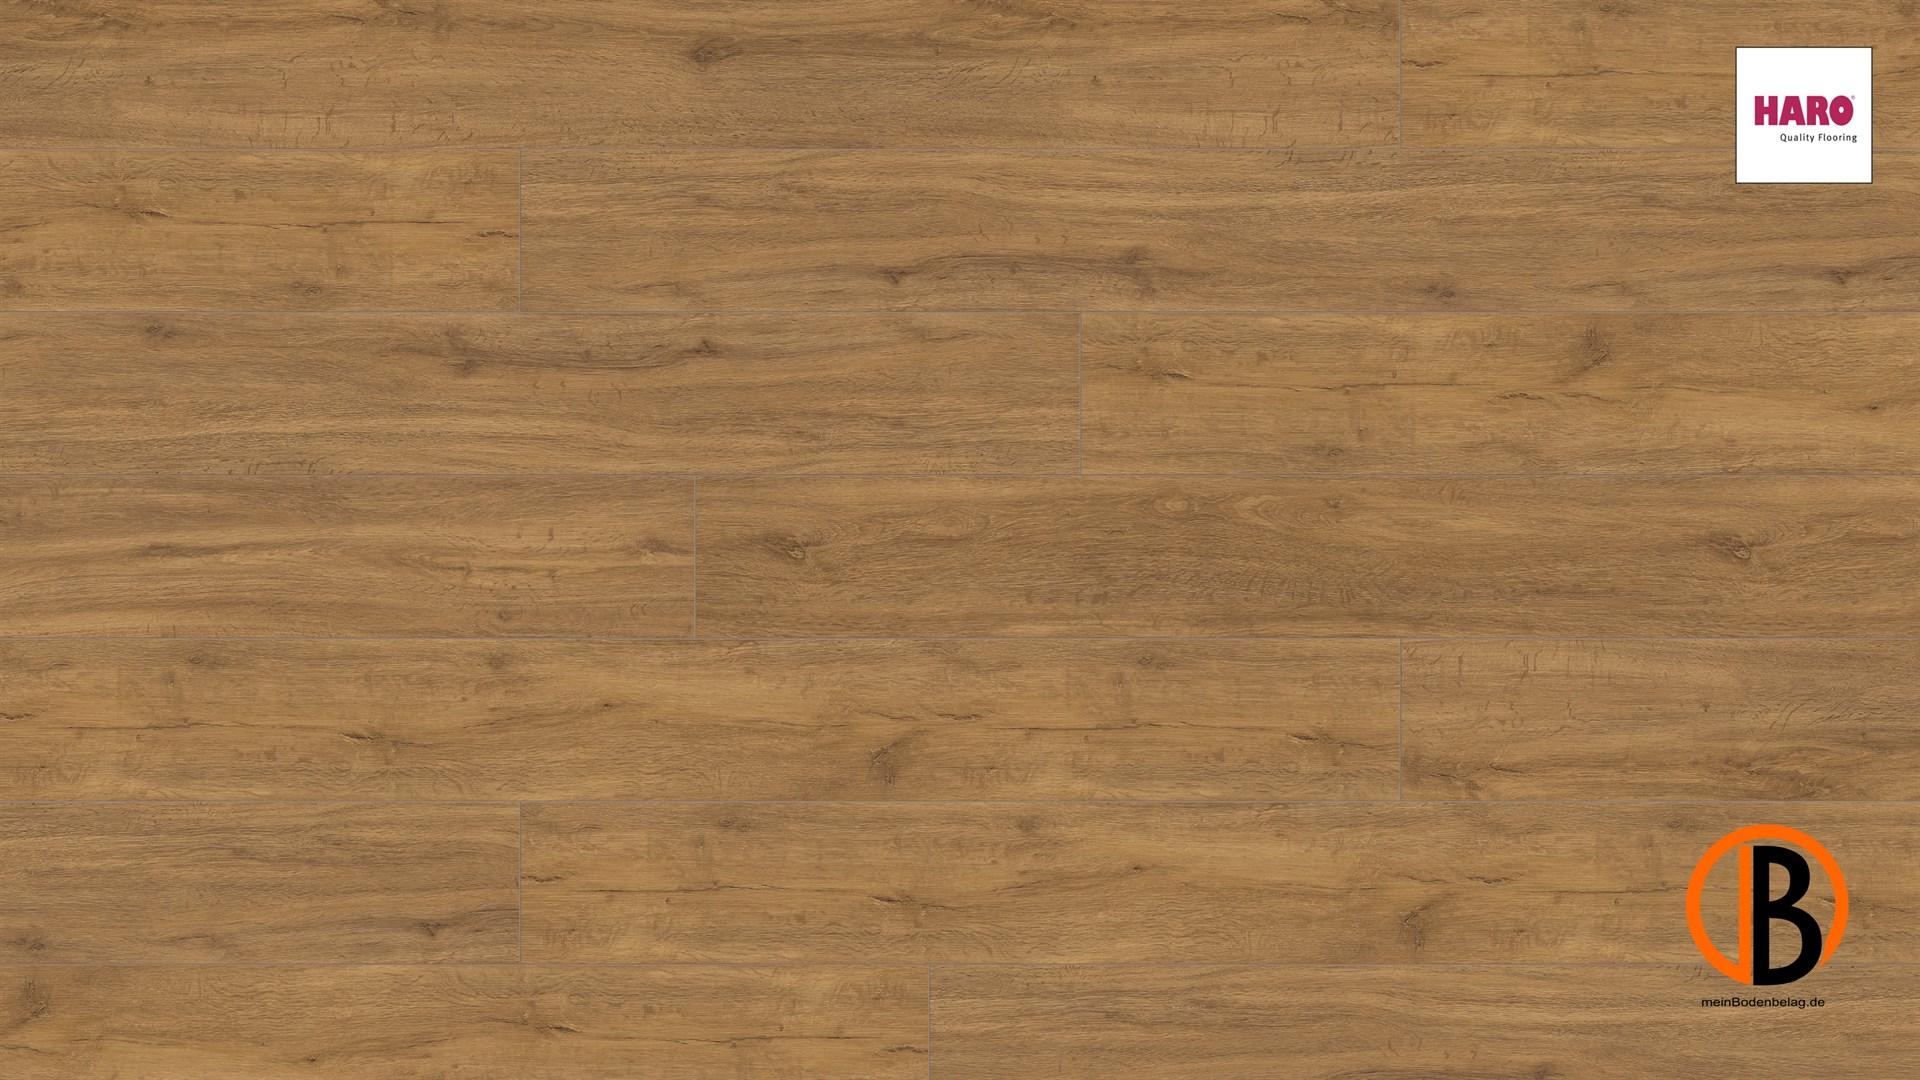 Fußboden Legen Xl ~ Haro disano classic aqua tc la xl v bergeiche strukt